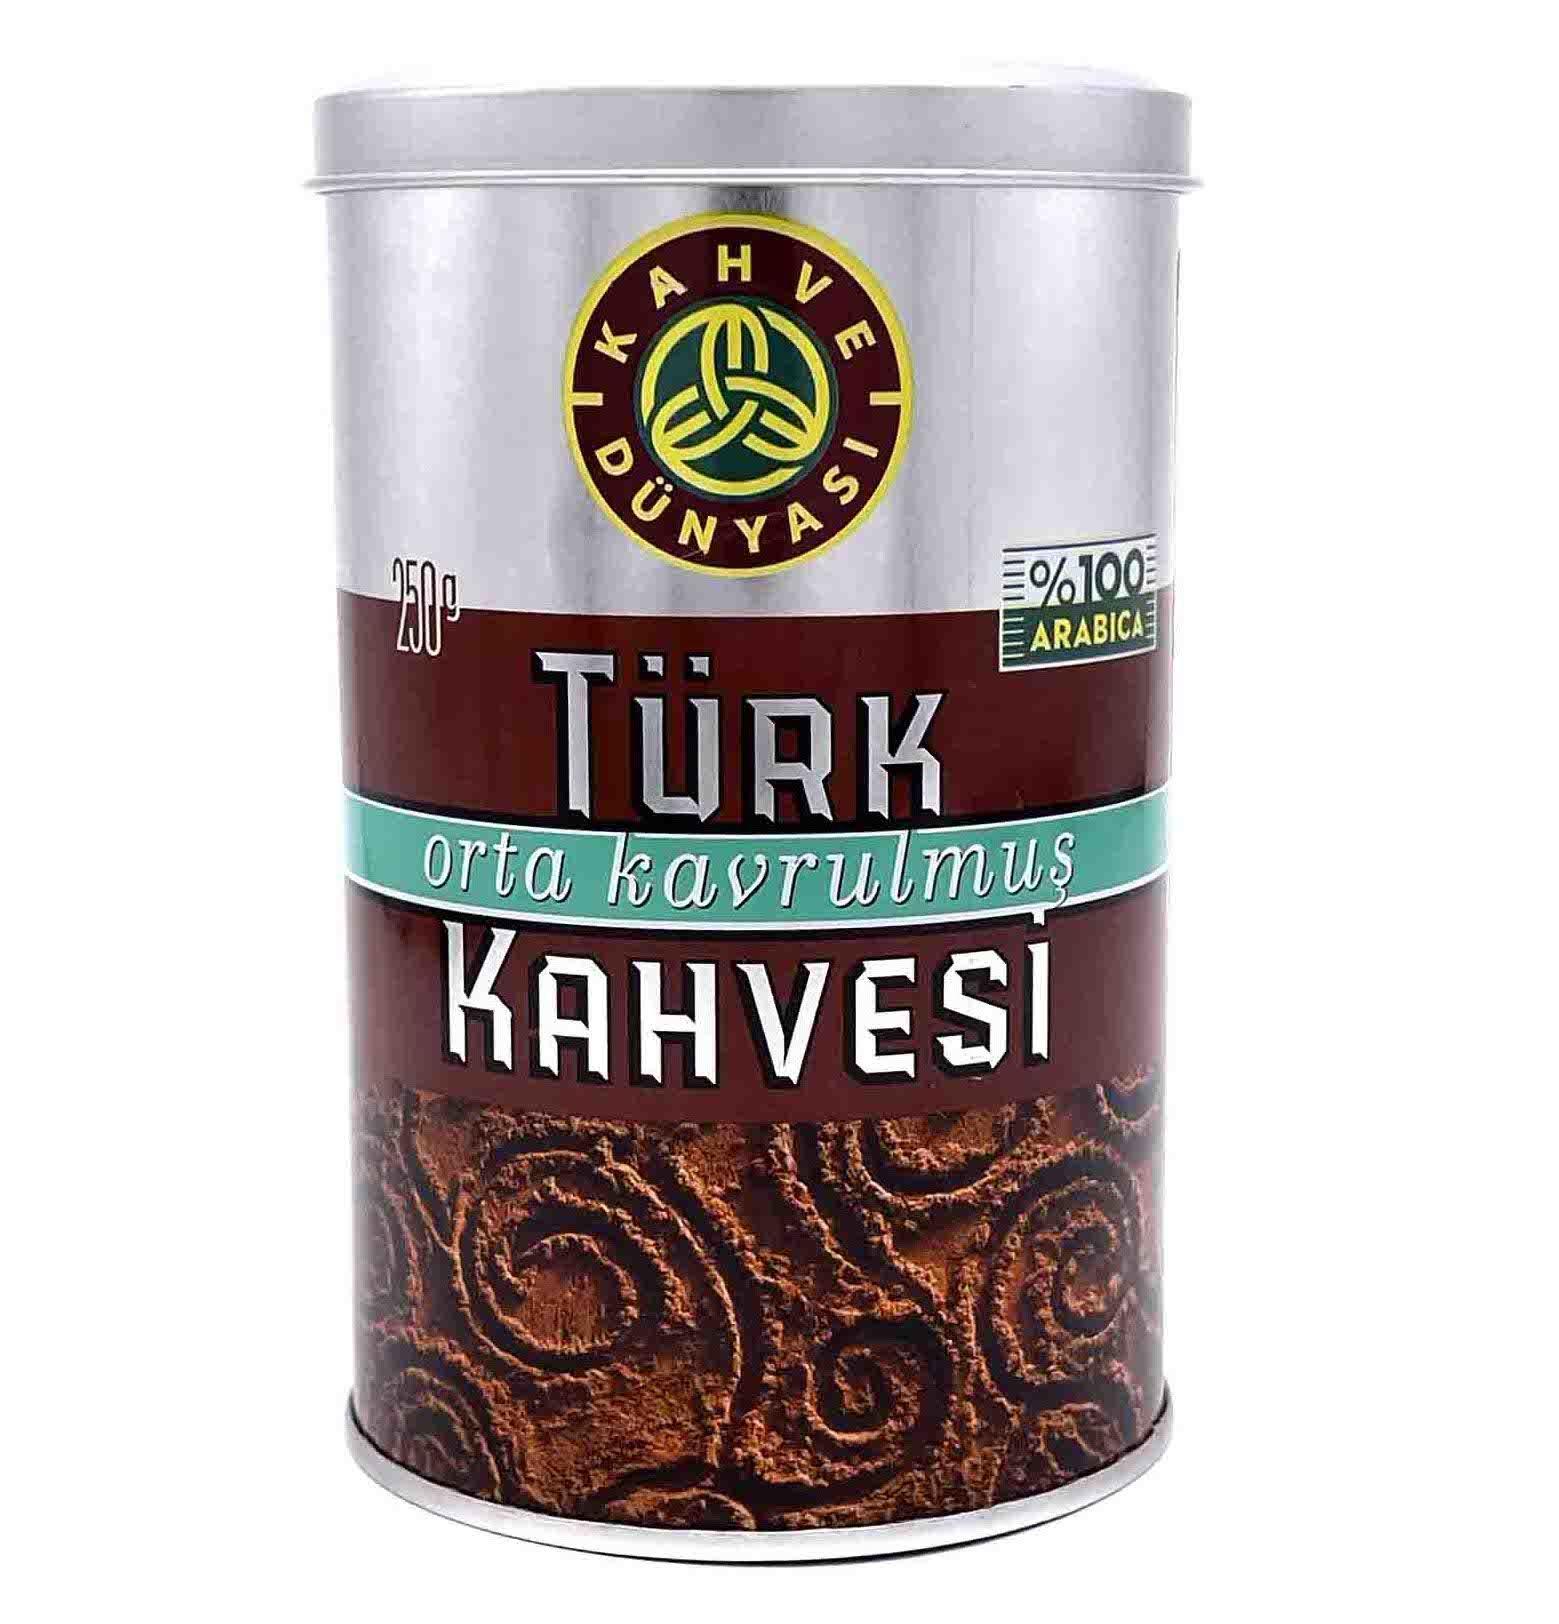 Кофе молотый Турецкий кофе молотый средней обжарки, Kahve Dunyasi, 250 г import_files_5a_5a55f9ad564711eba9df484d7ecee297_022e0d875faf11eba9e2484d7ecee297.jpg